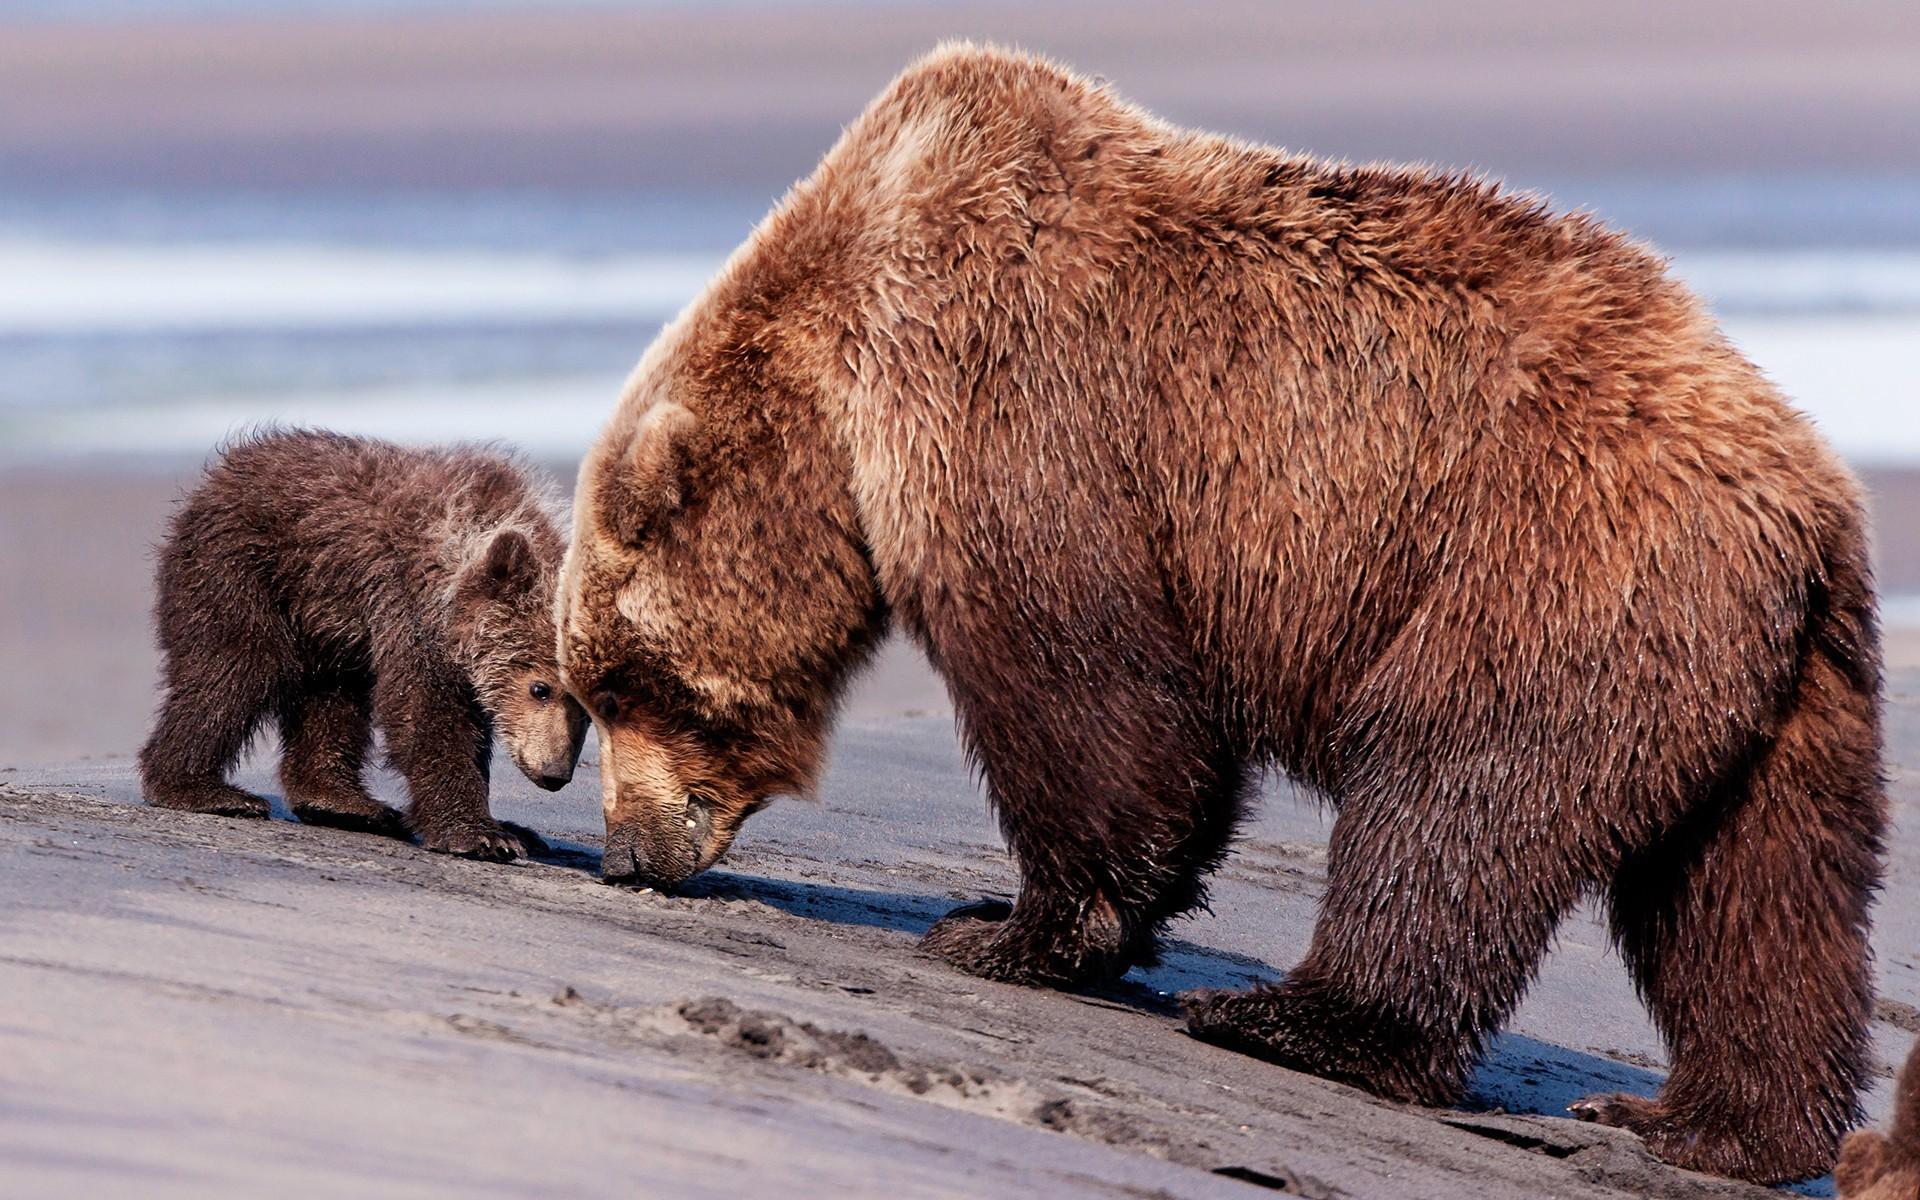 Attractive Bear Grass Wet Snout Download Hd Wallpaper Image